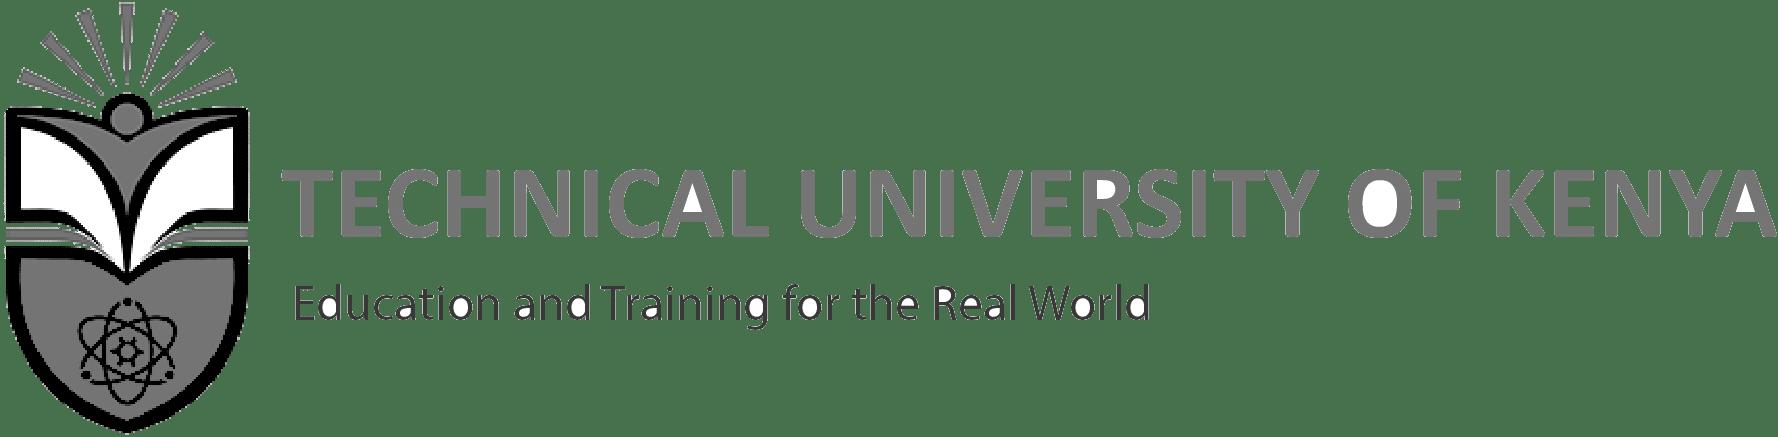 Technical University of Kenya September 2017 Intake